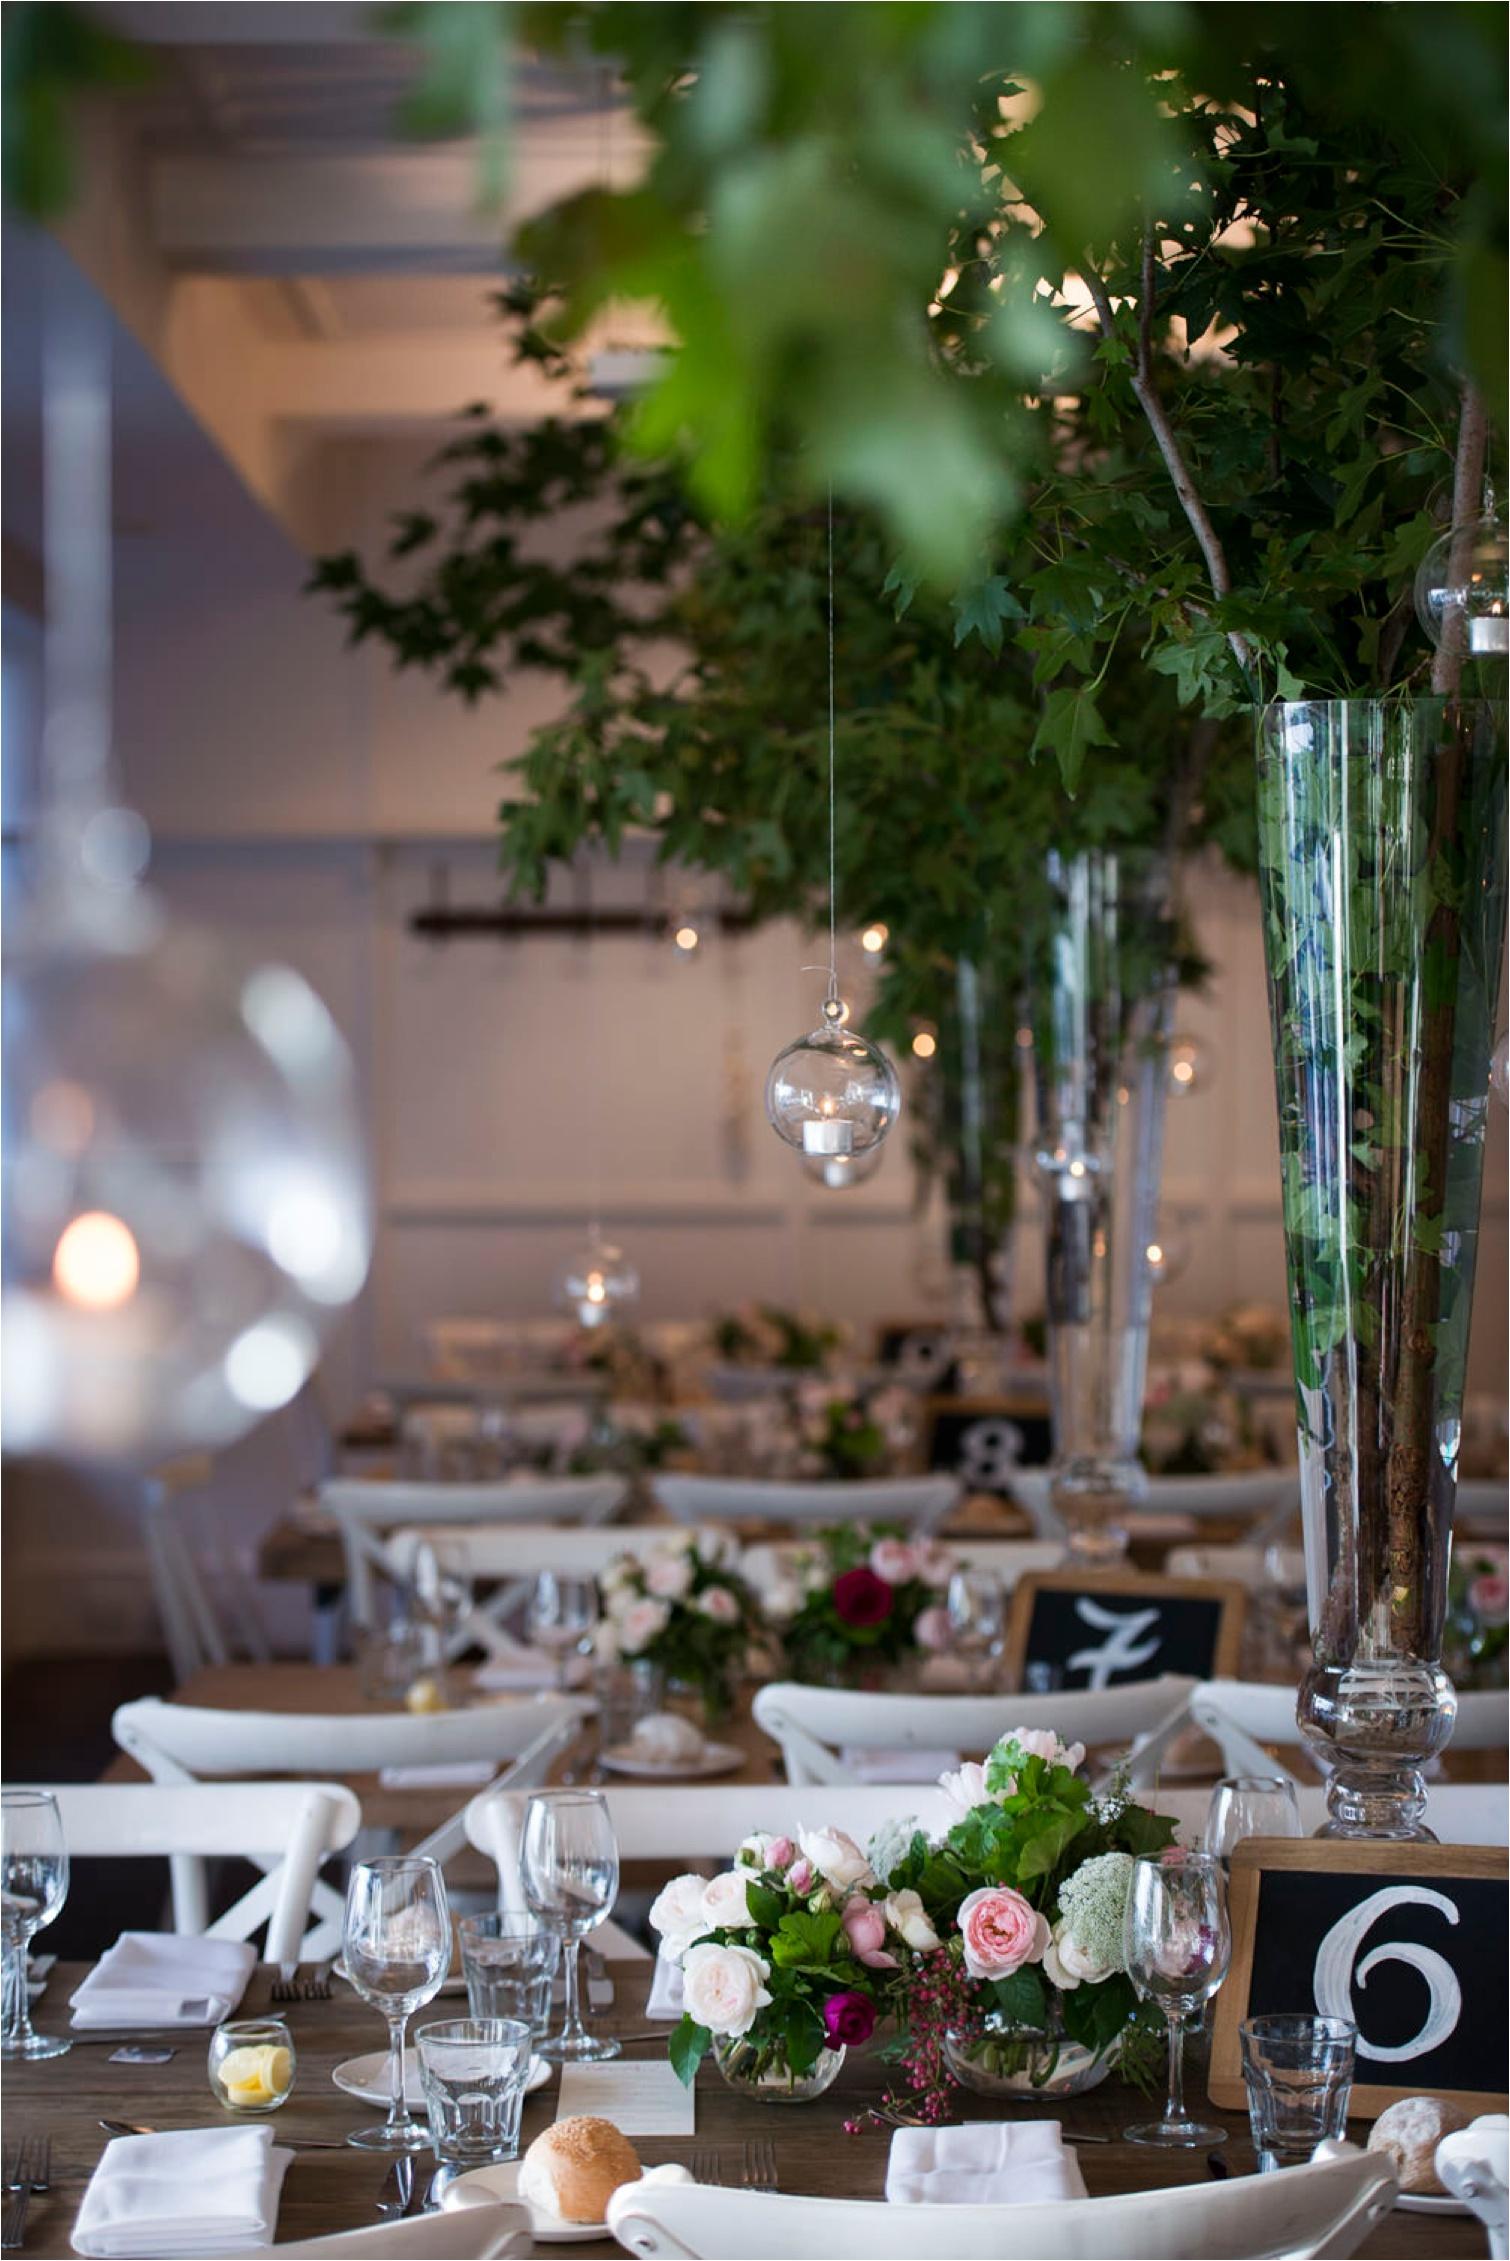 Nicole&Carlie_Watsons_Bay_Hotel_Wedding_by_Gold_Coast_Photographers-The_Follans49.jpg